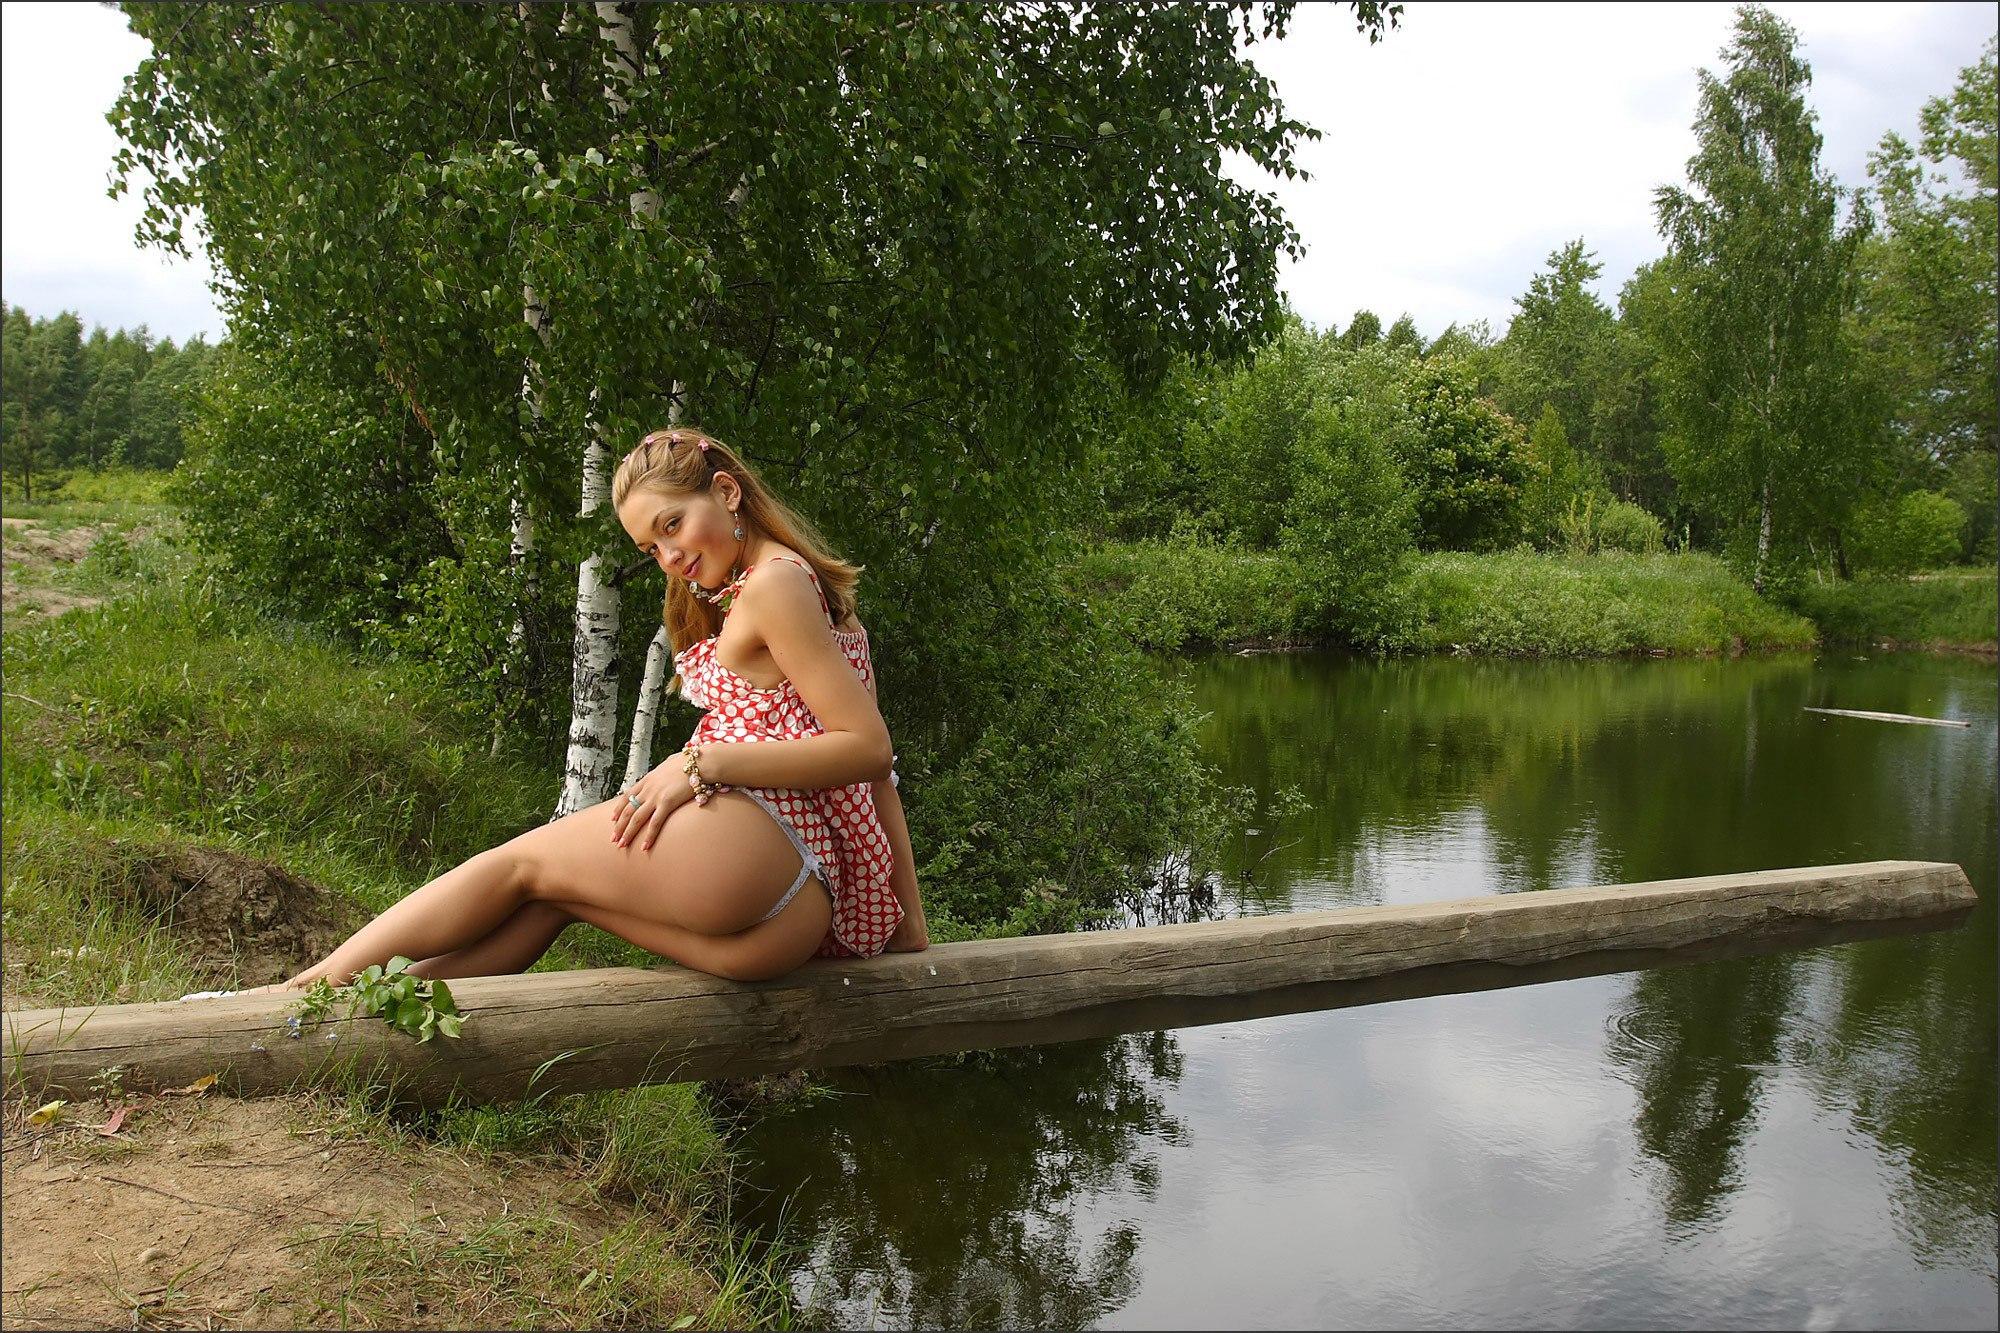 People 2000x1333 women blonde river ass dress panties trees smiling women outdoors tanned